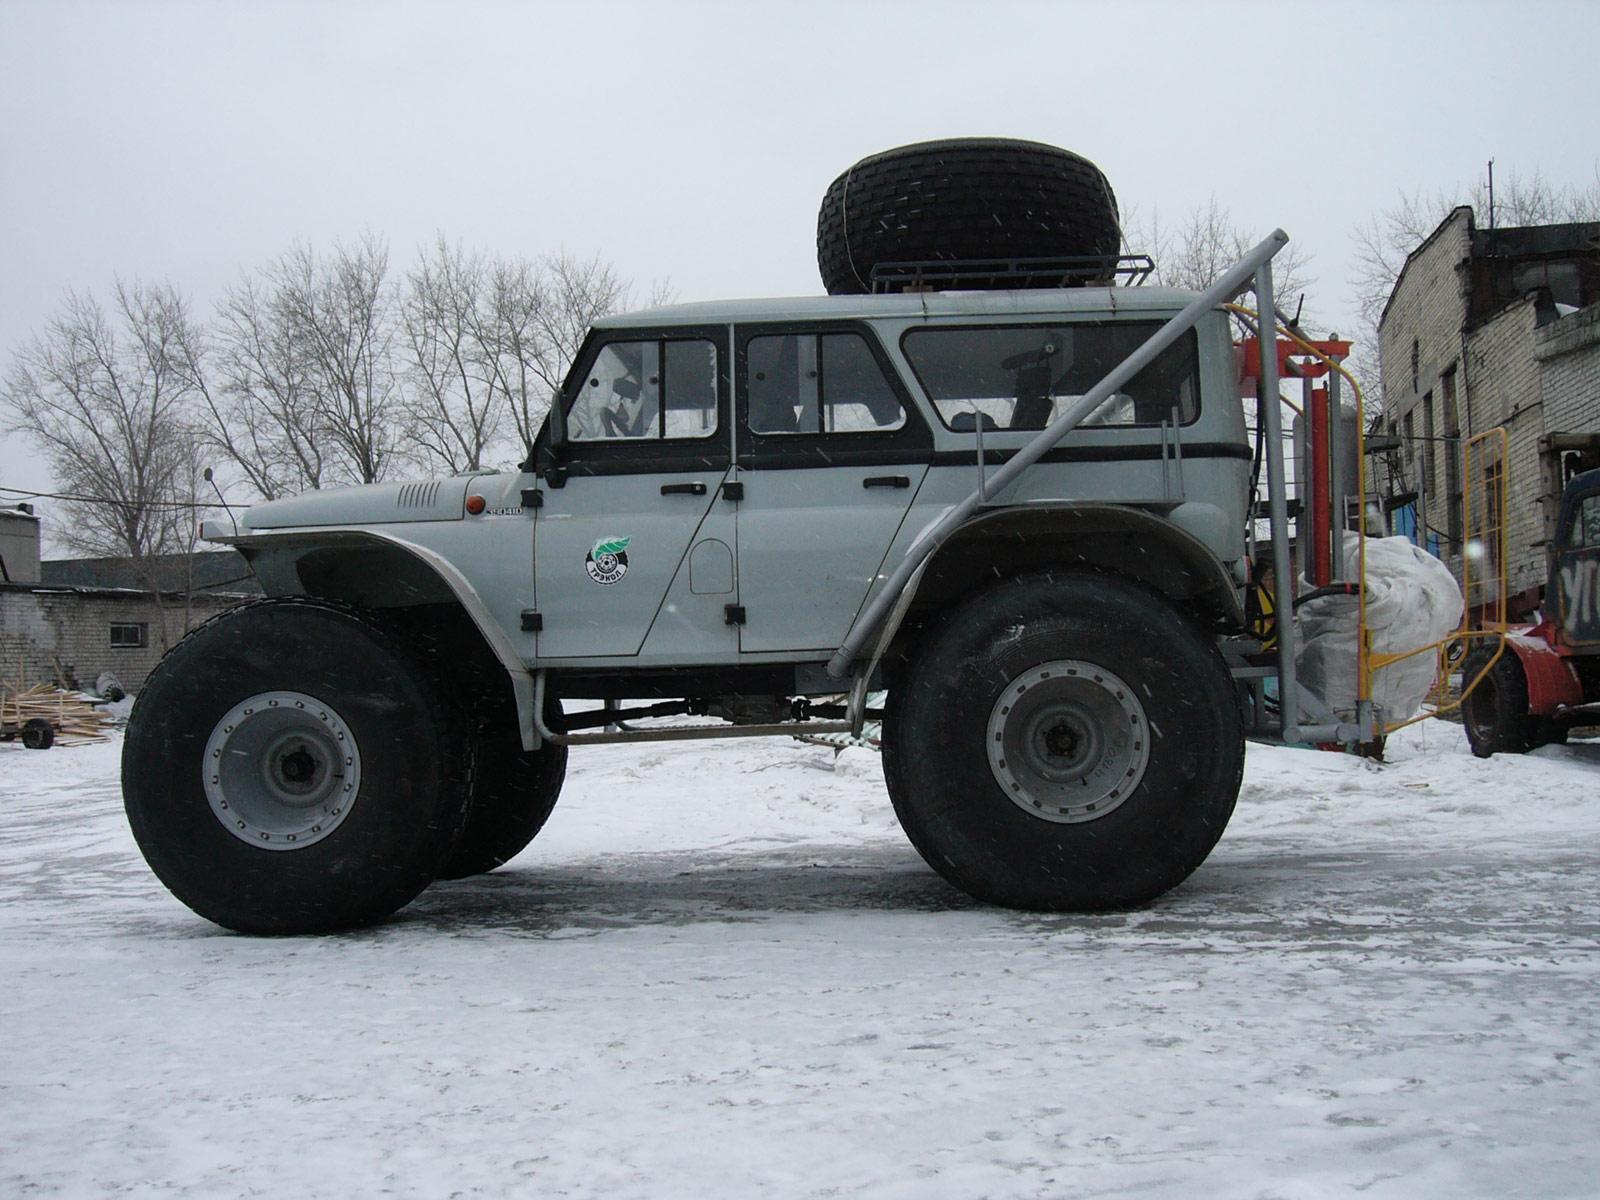 Установка буровая шнековая малогабаритная УБШМ-1-13 на базе ТРЭКОЛ 39041D